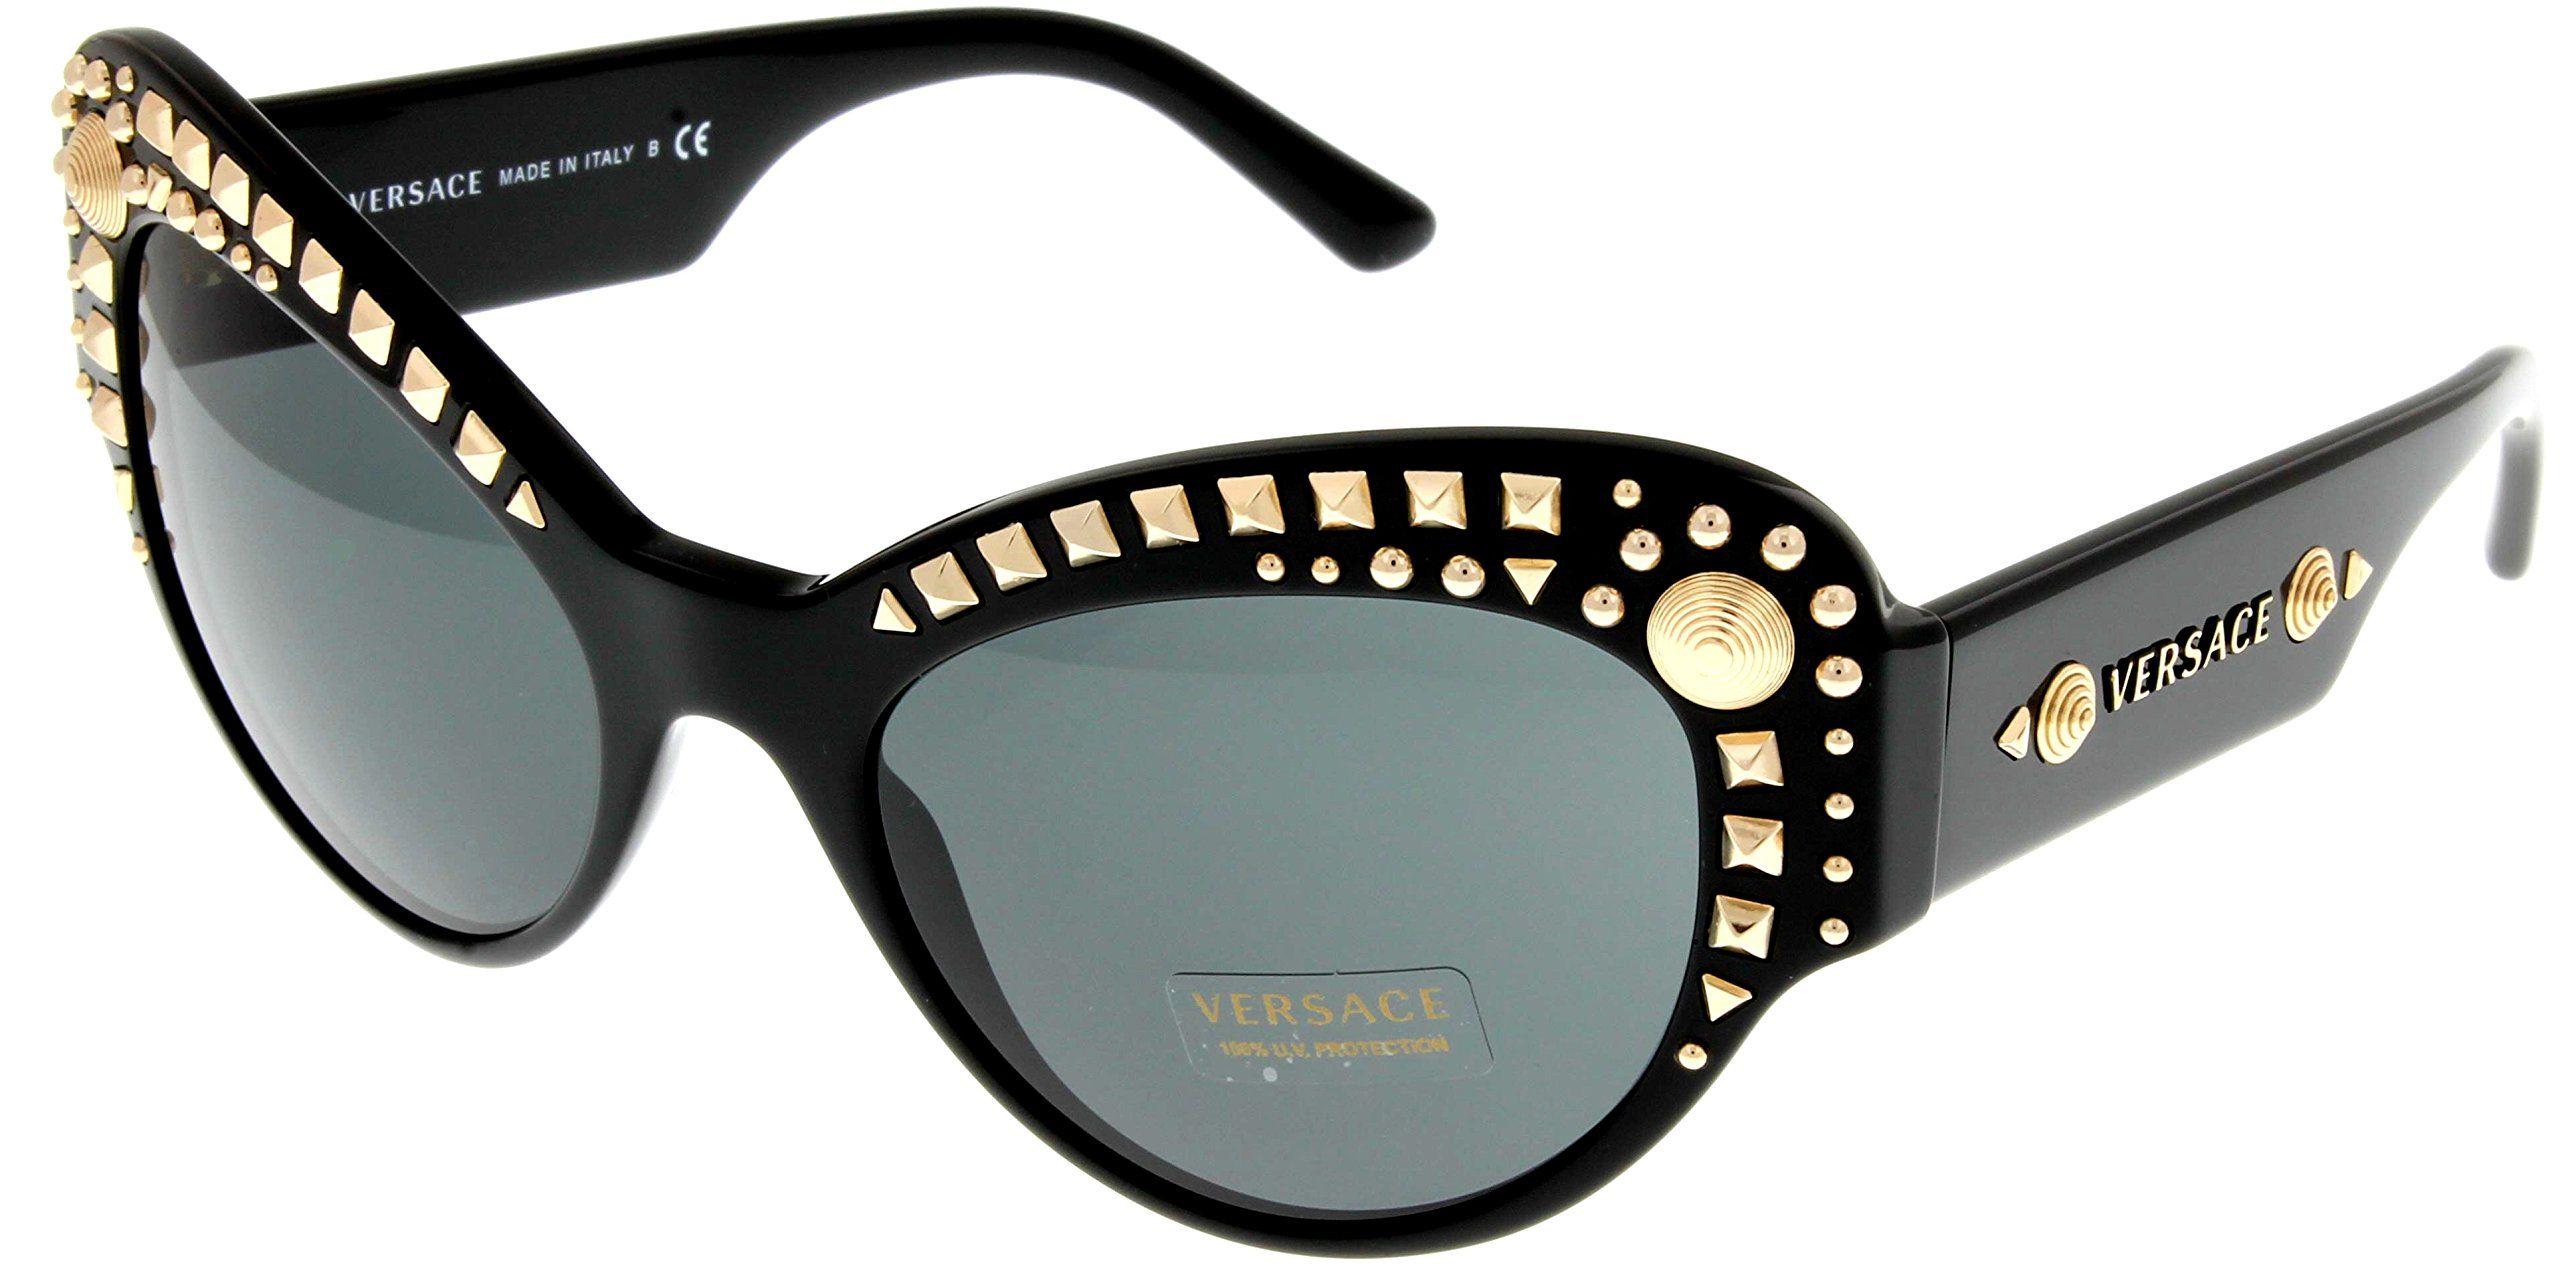 5962bfaa0010 Versace Sunglasses Womens Black Cateye 100% UV Protection VE4269 GB1 ...